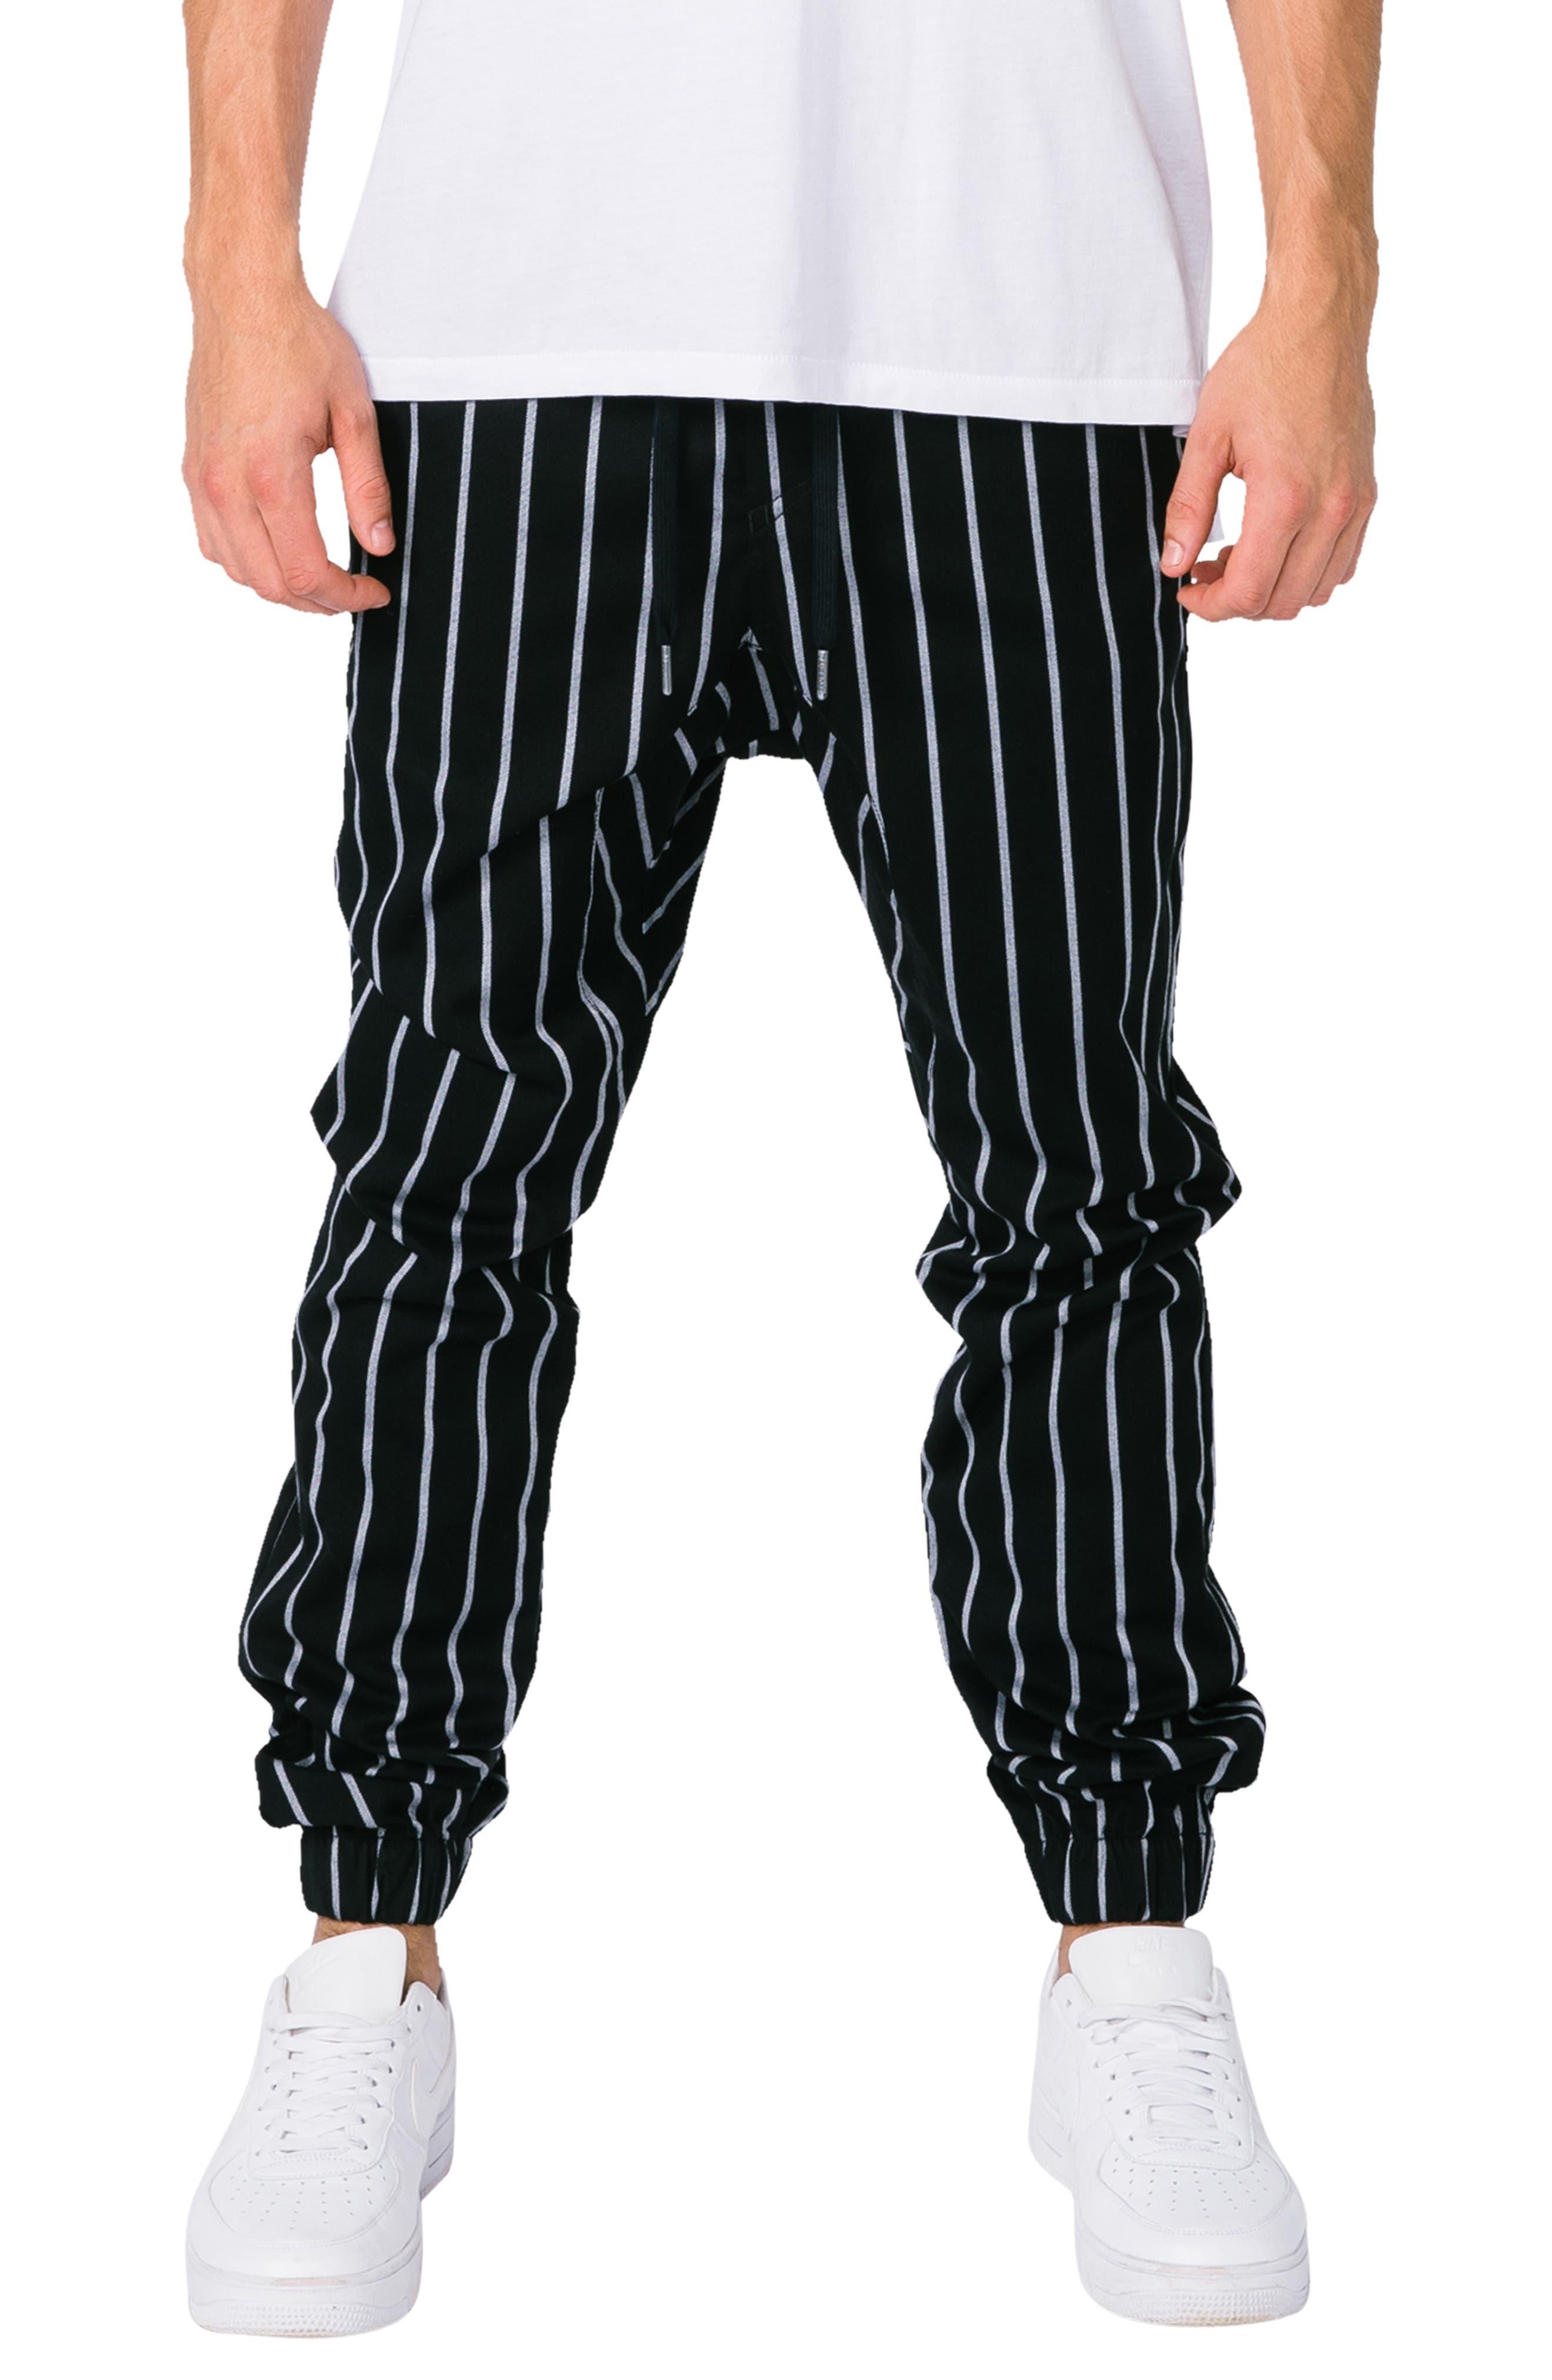 Zanerobe Sureshot Slim Fit Stripe Sweatpants, Black